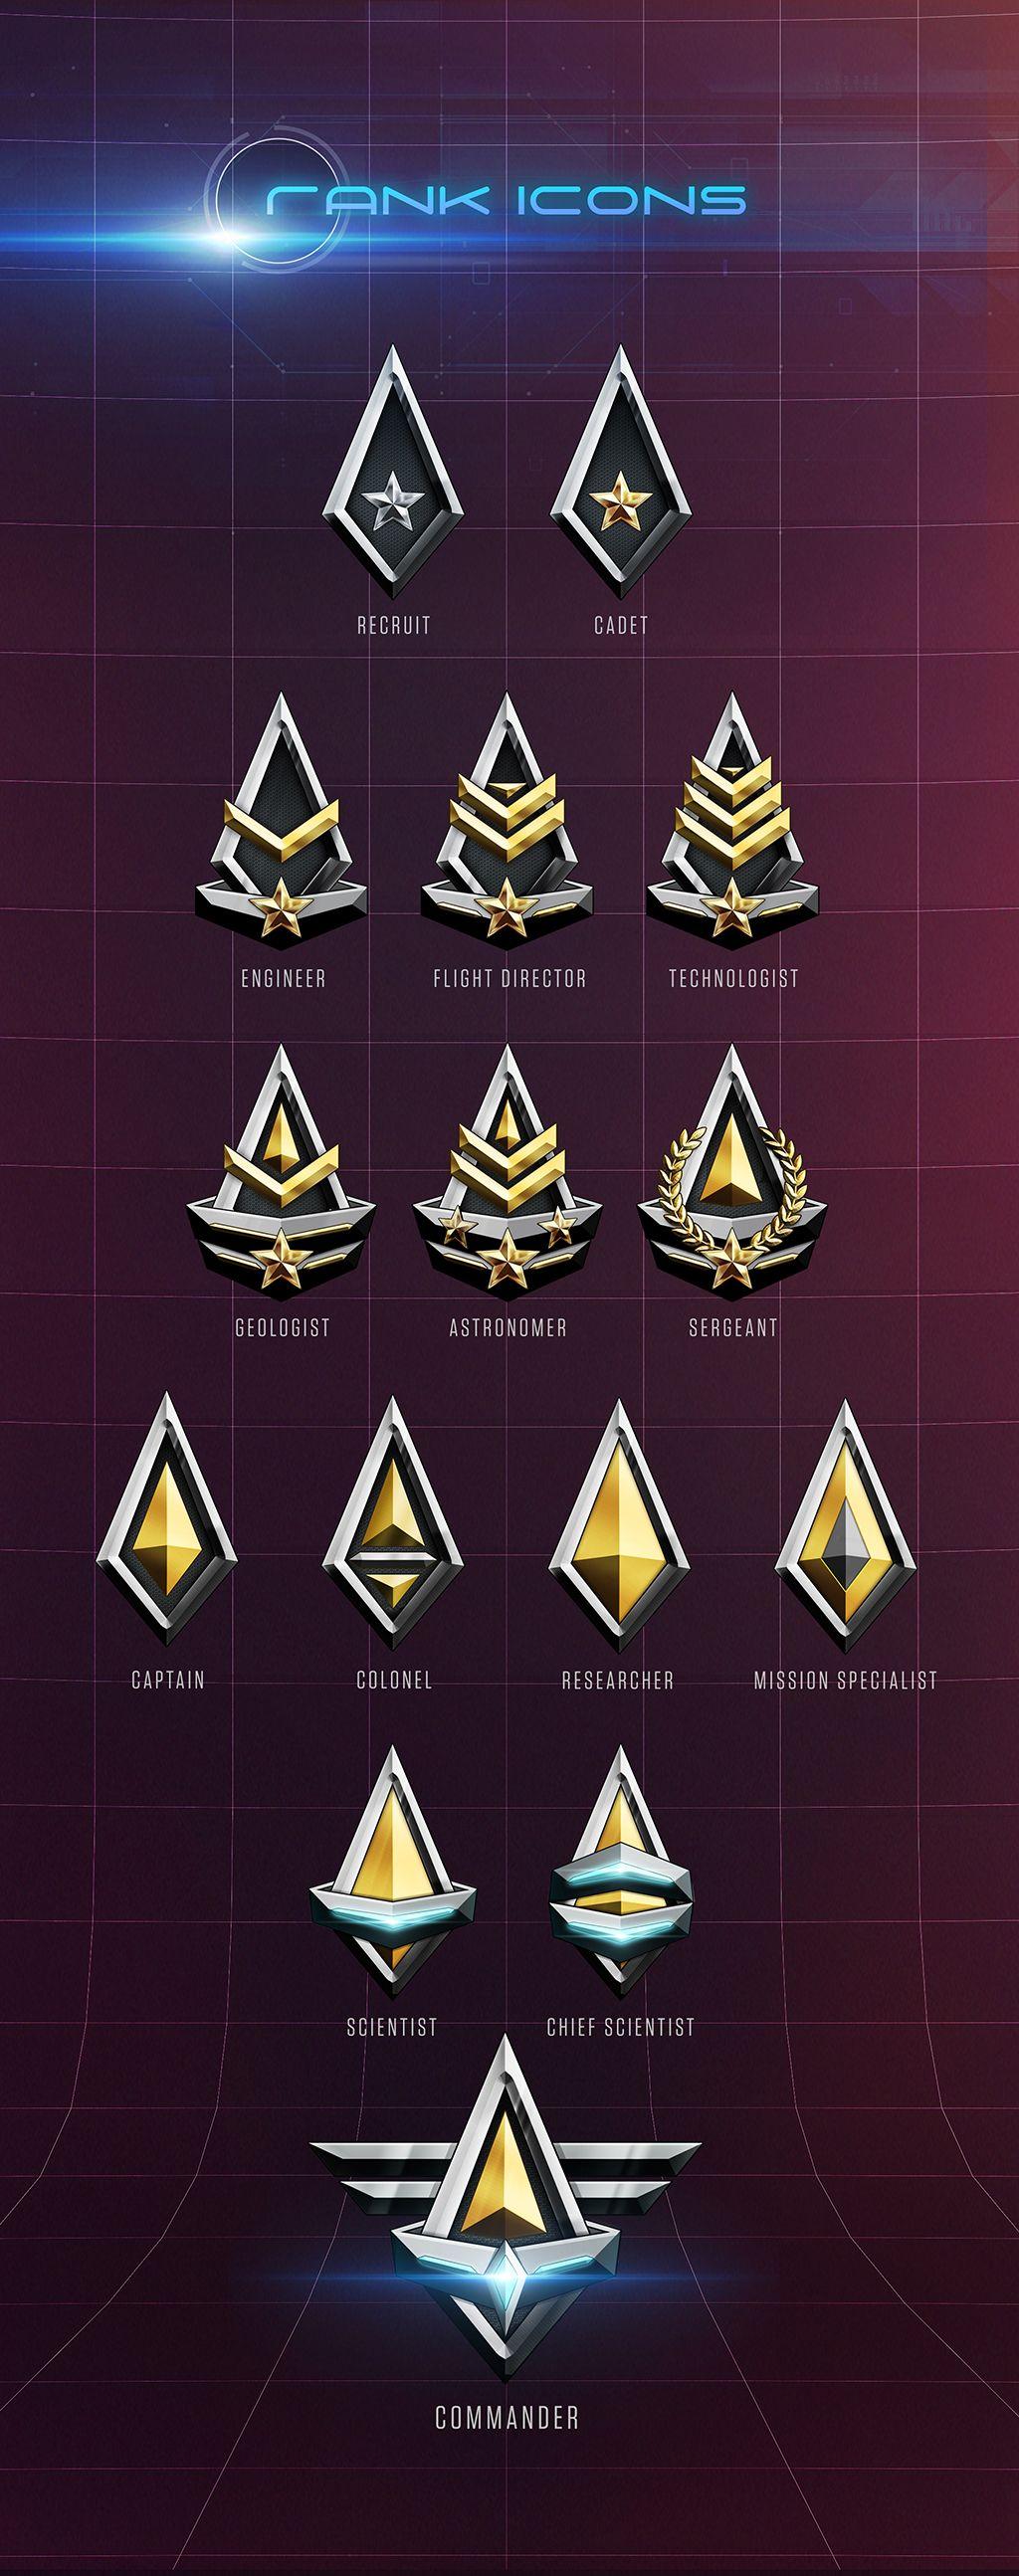 teamspeak rank icons  ikonki na ts3 16x16 firefox.php #5